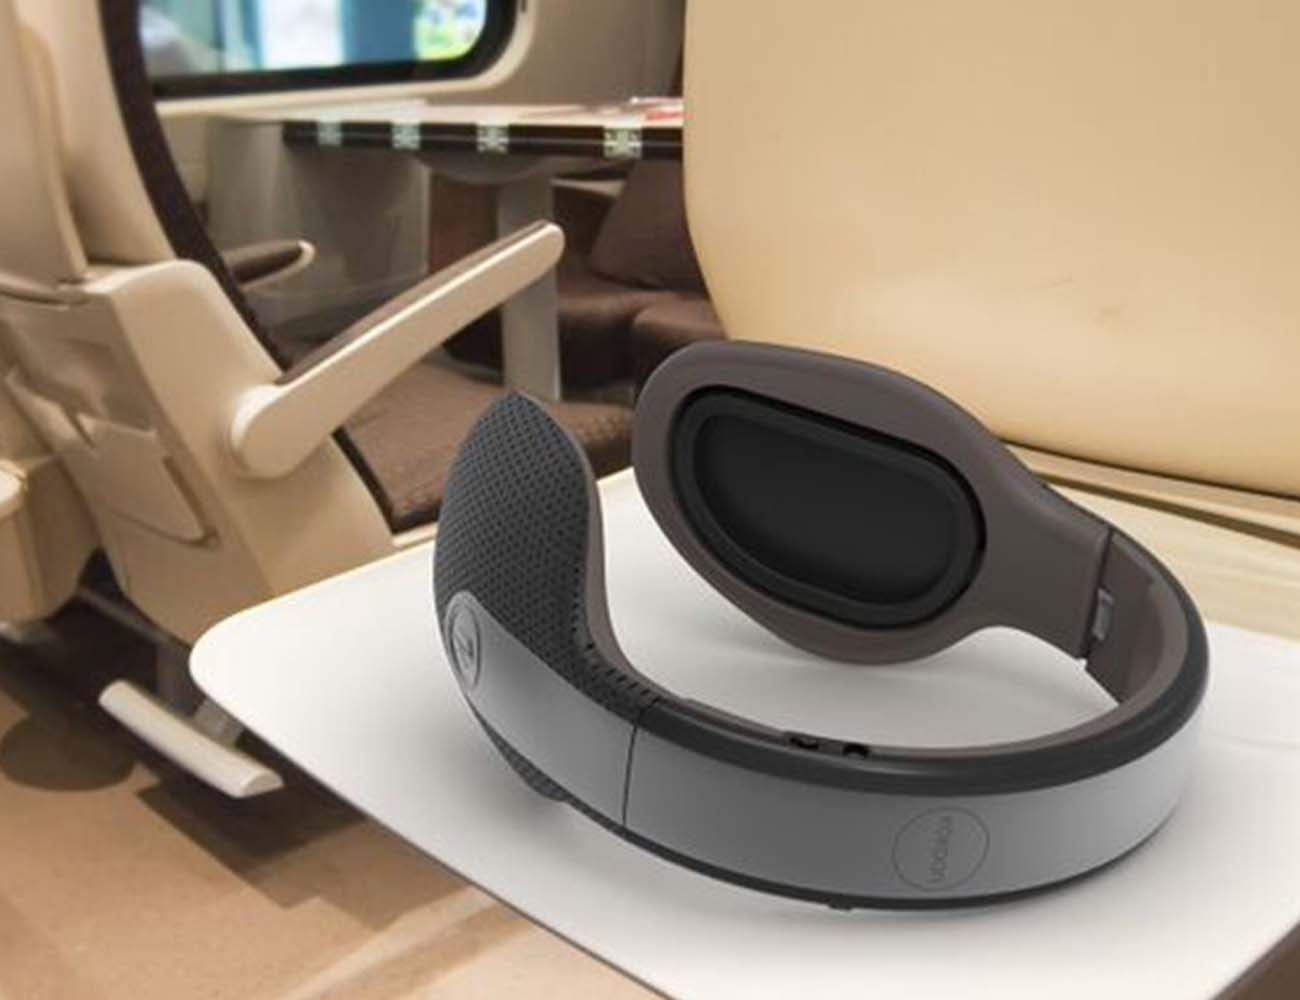 The Ultimate Sleep Sanctuary –  Kokoon EEG Headphones